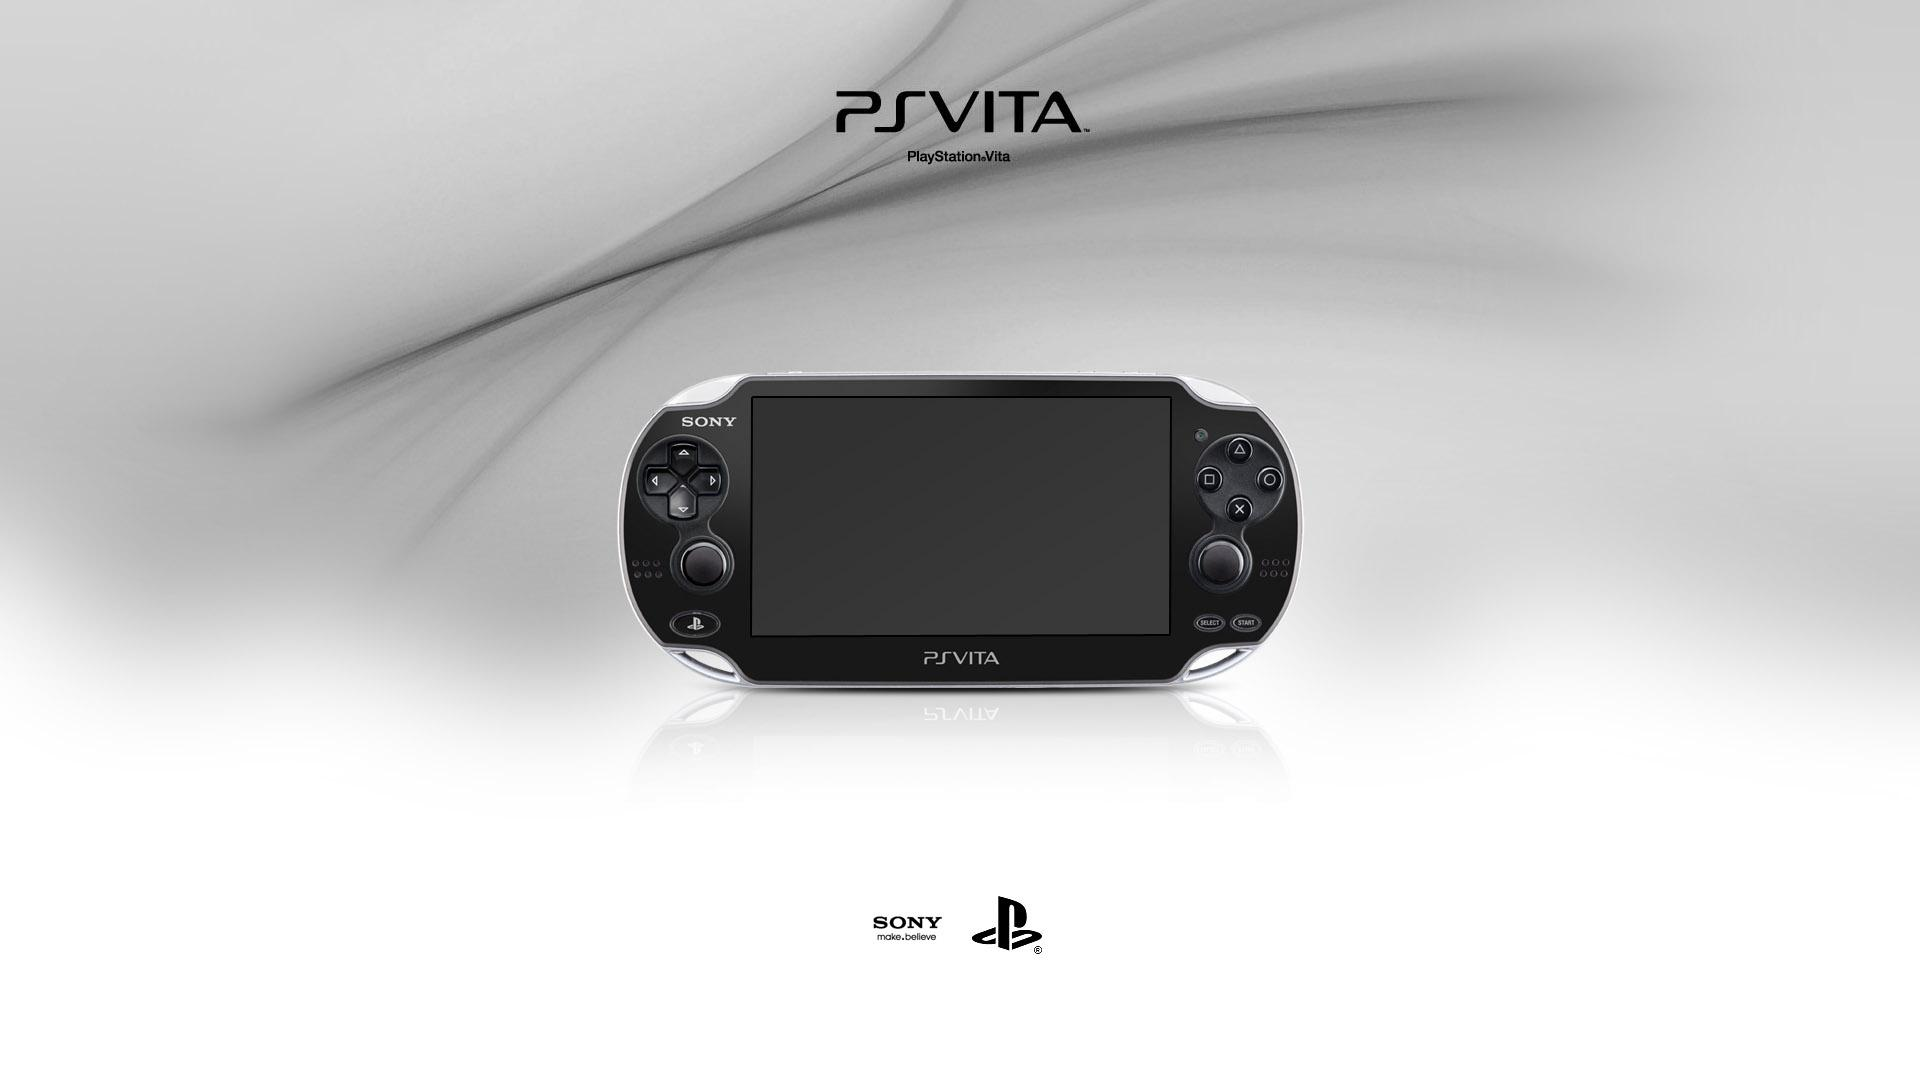 PS-Vita-Sony-PlayStation-Vita-Black-1080x1920.jpg